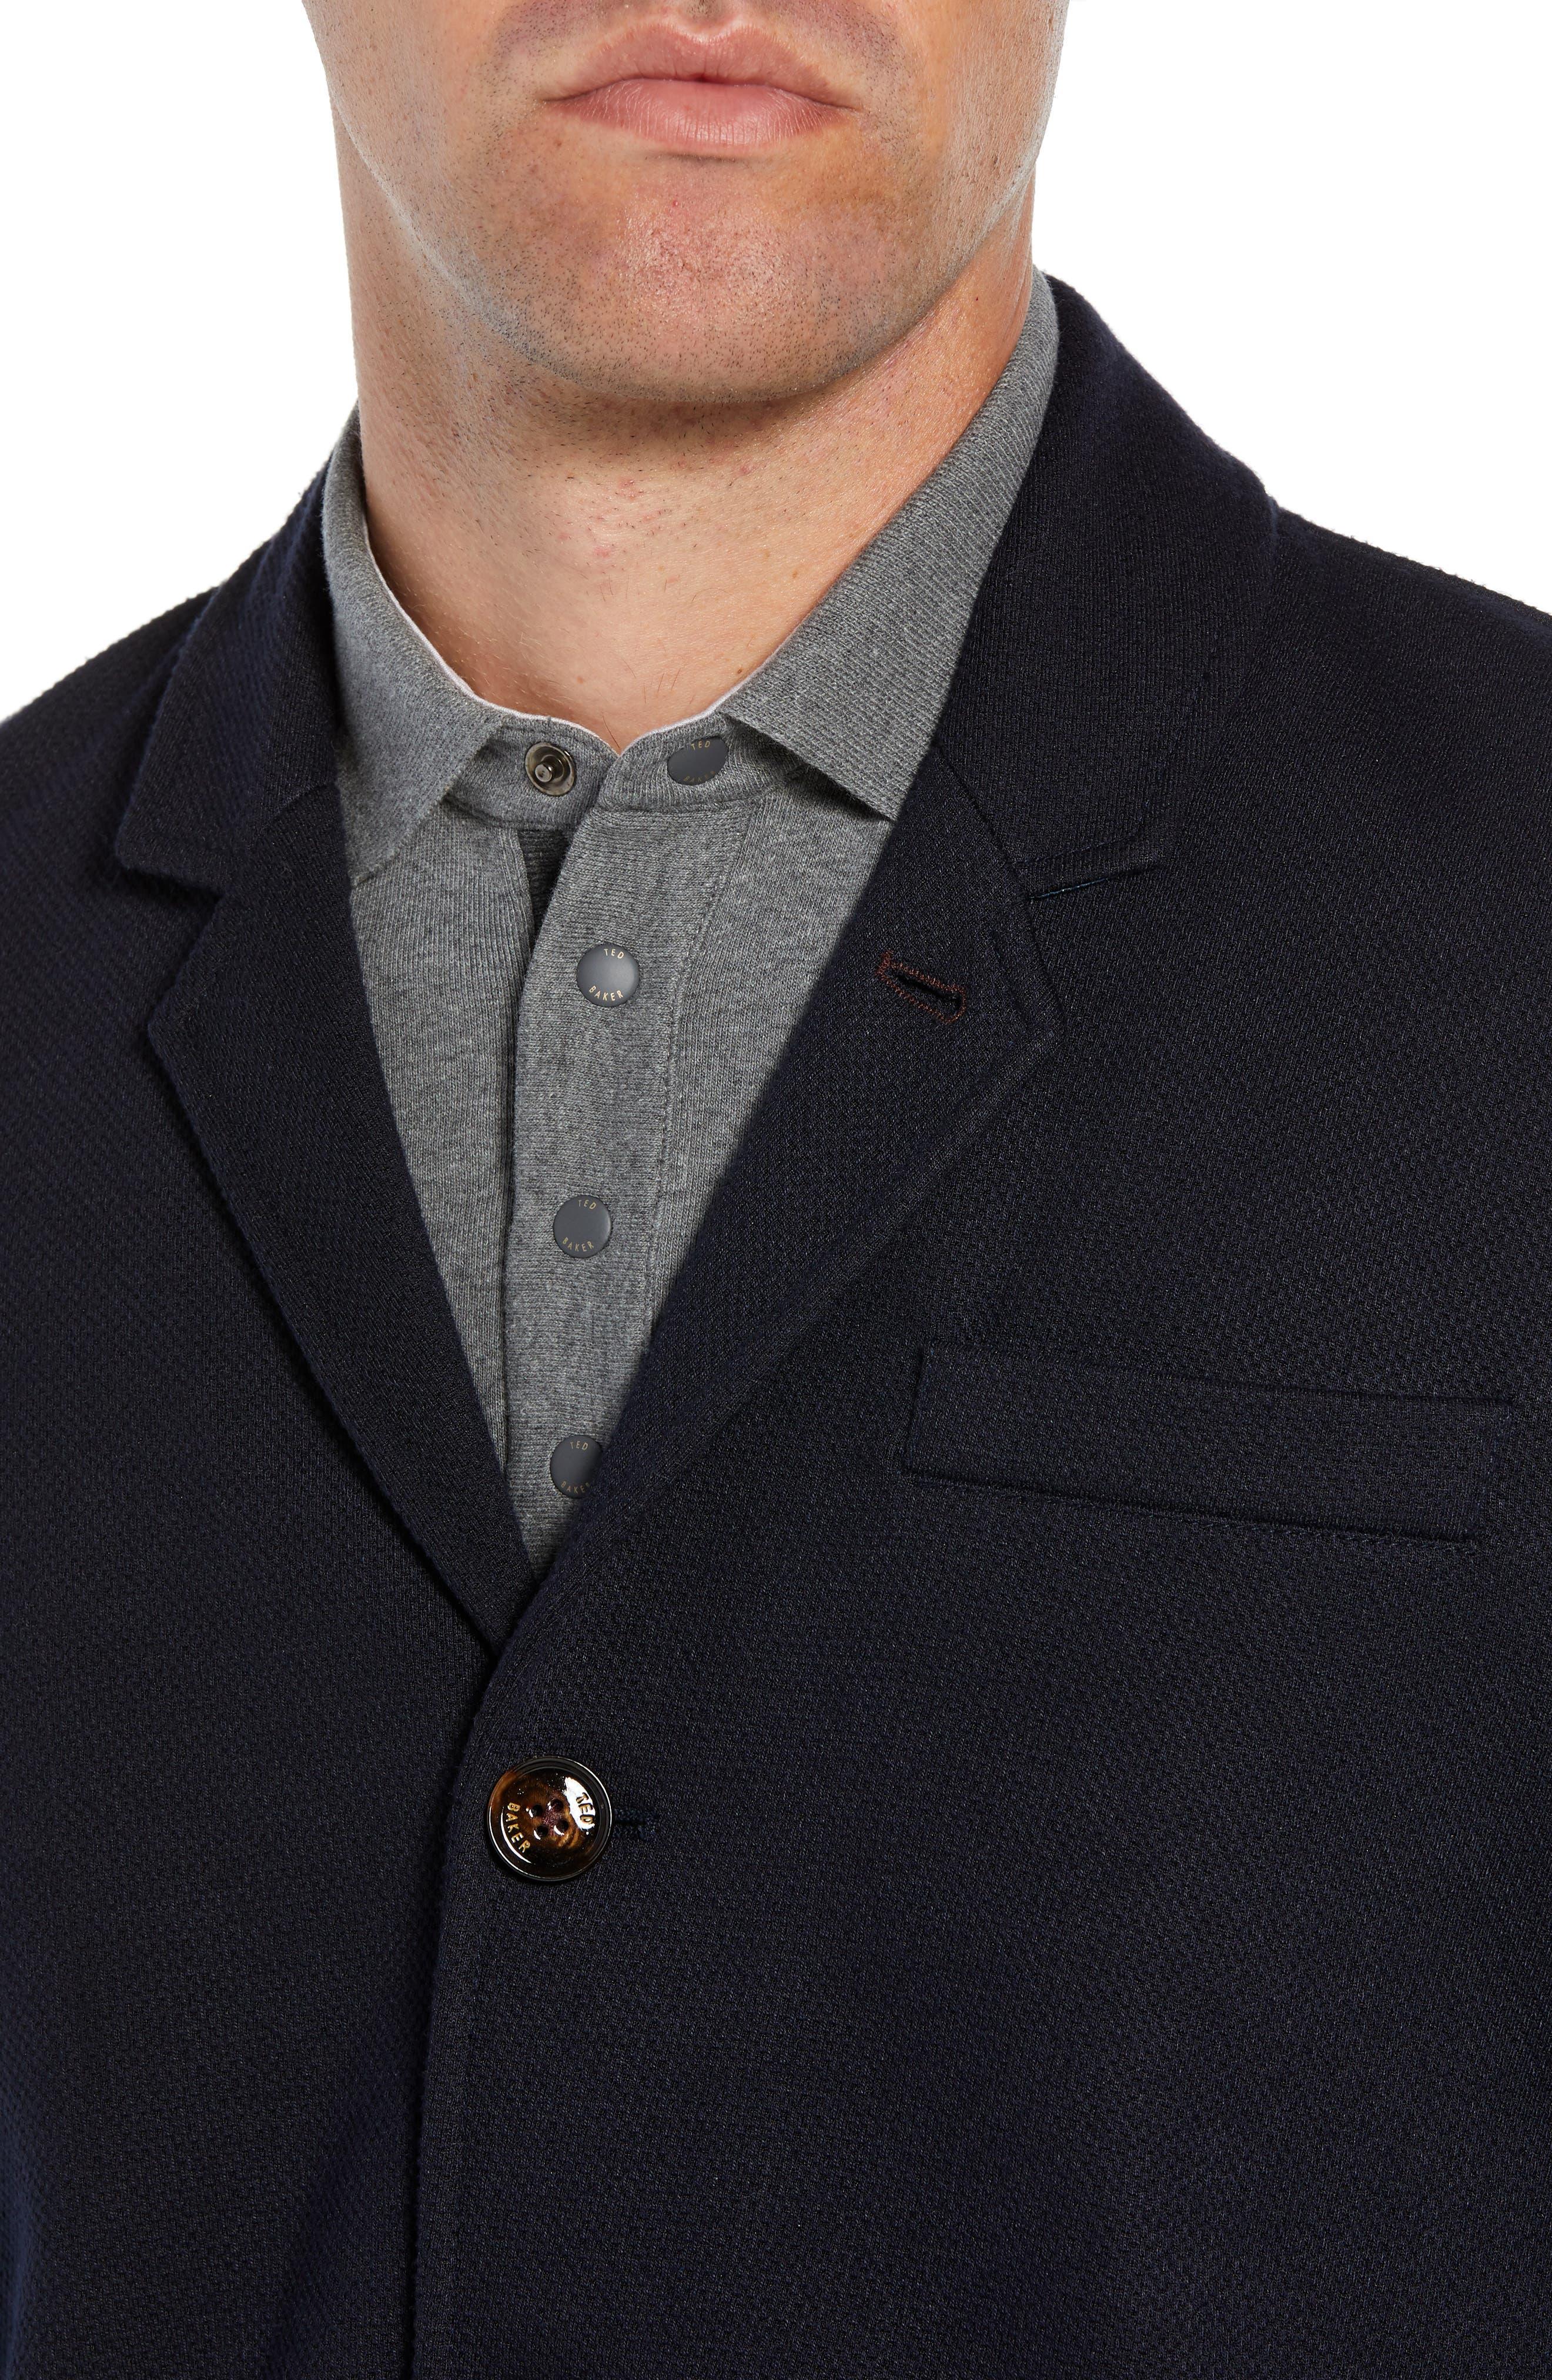 Almond Slim Fit Jersey Blazer,                             Alternate thumbnail 4, color,                             NAVY